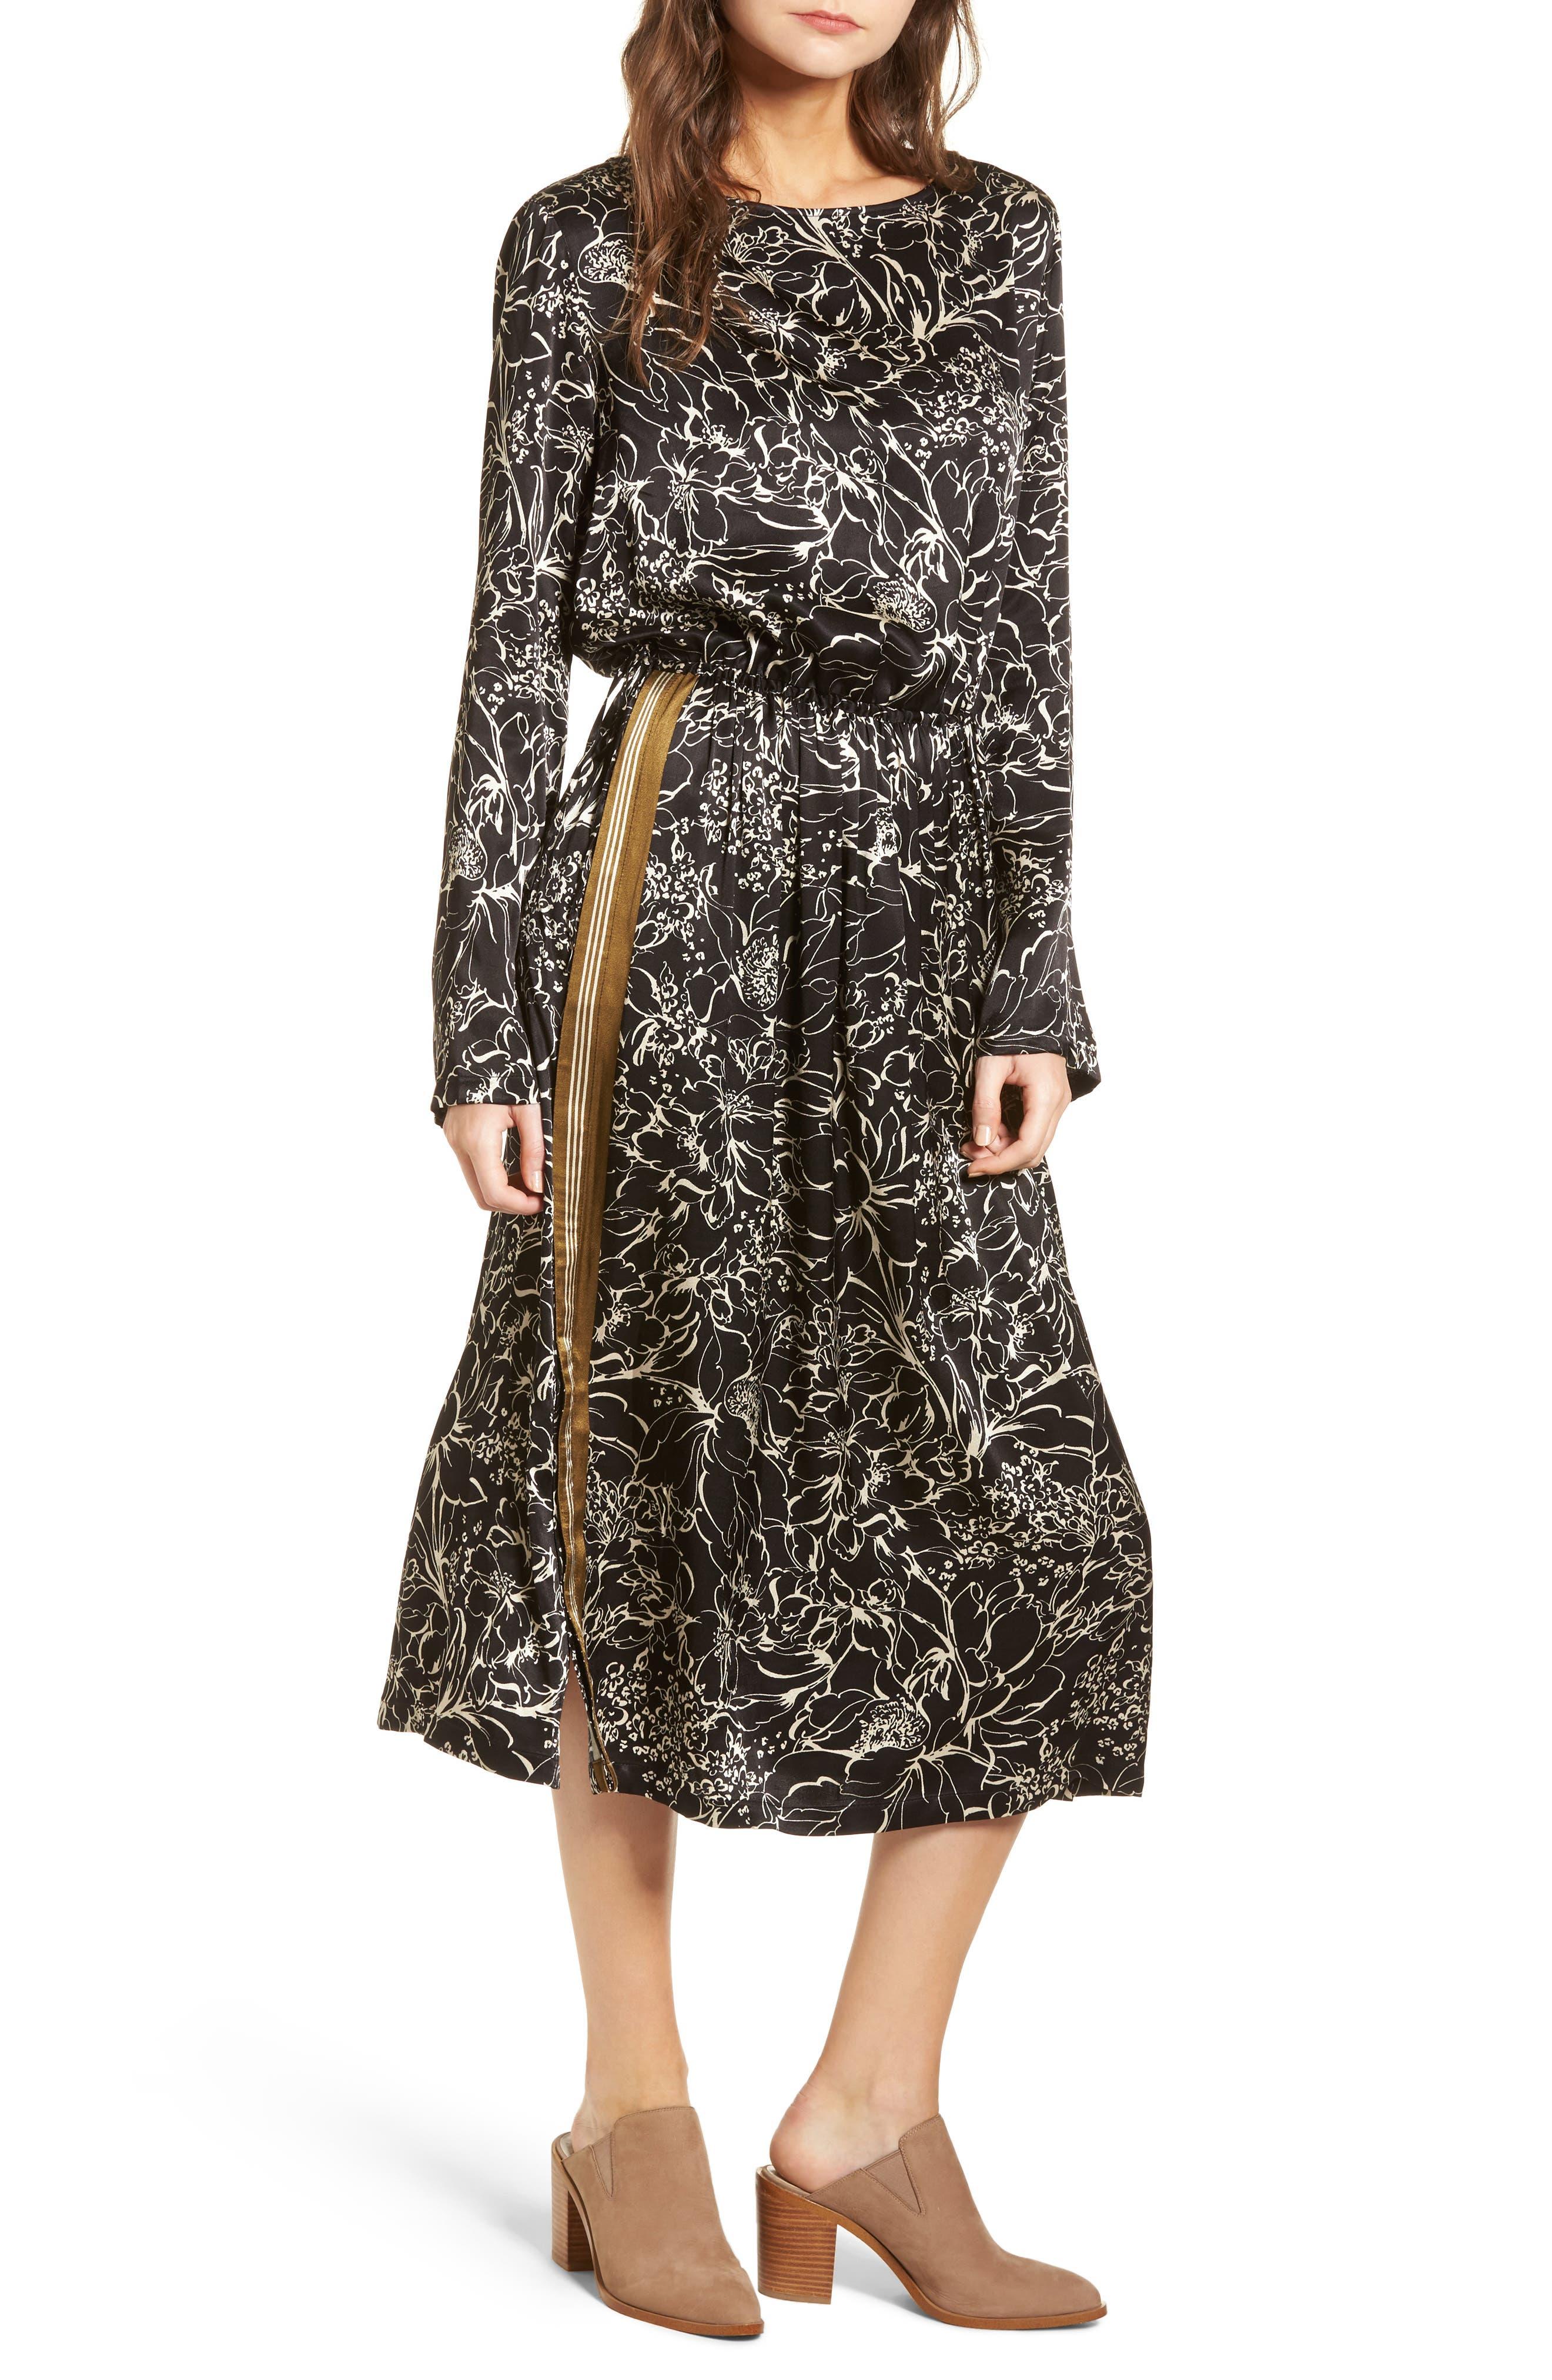 Treasure & Bond Blouson Print Dress